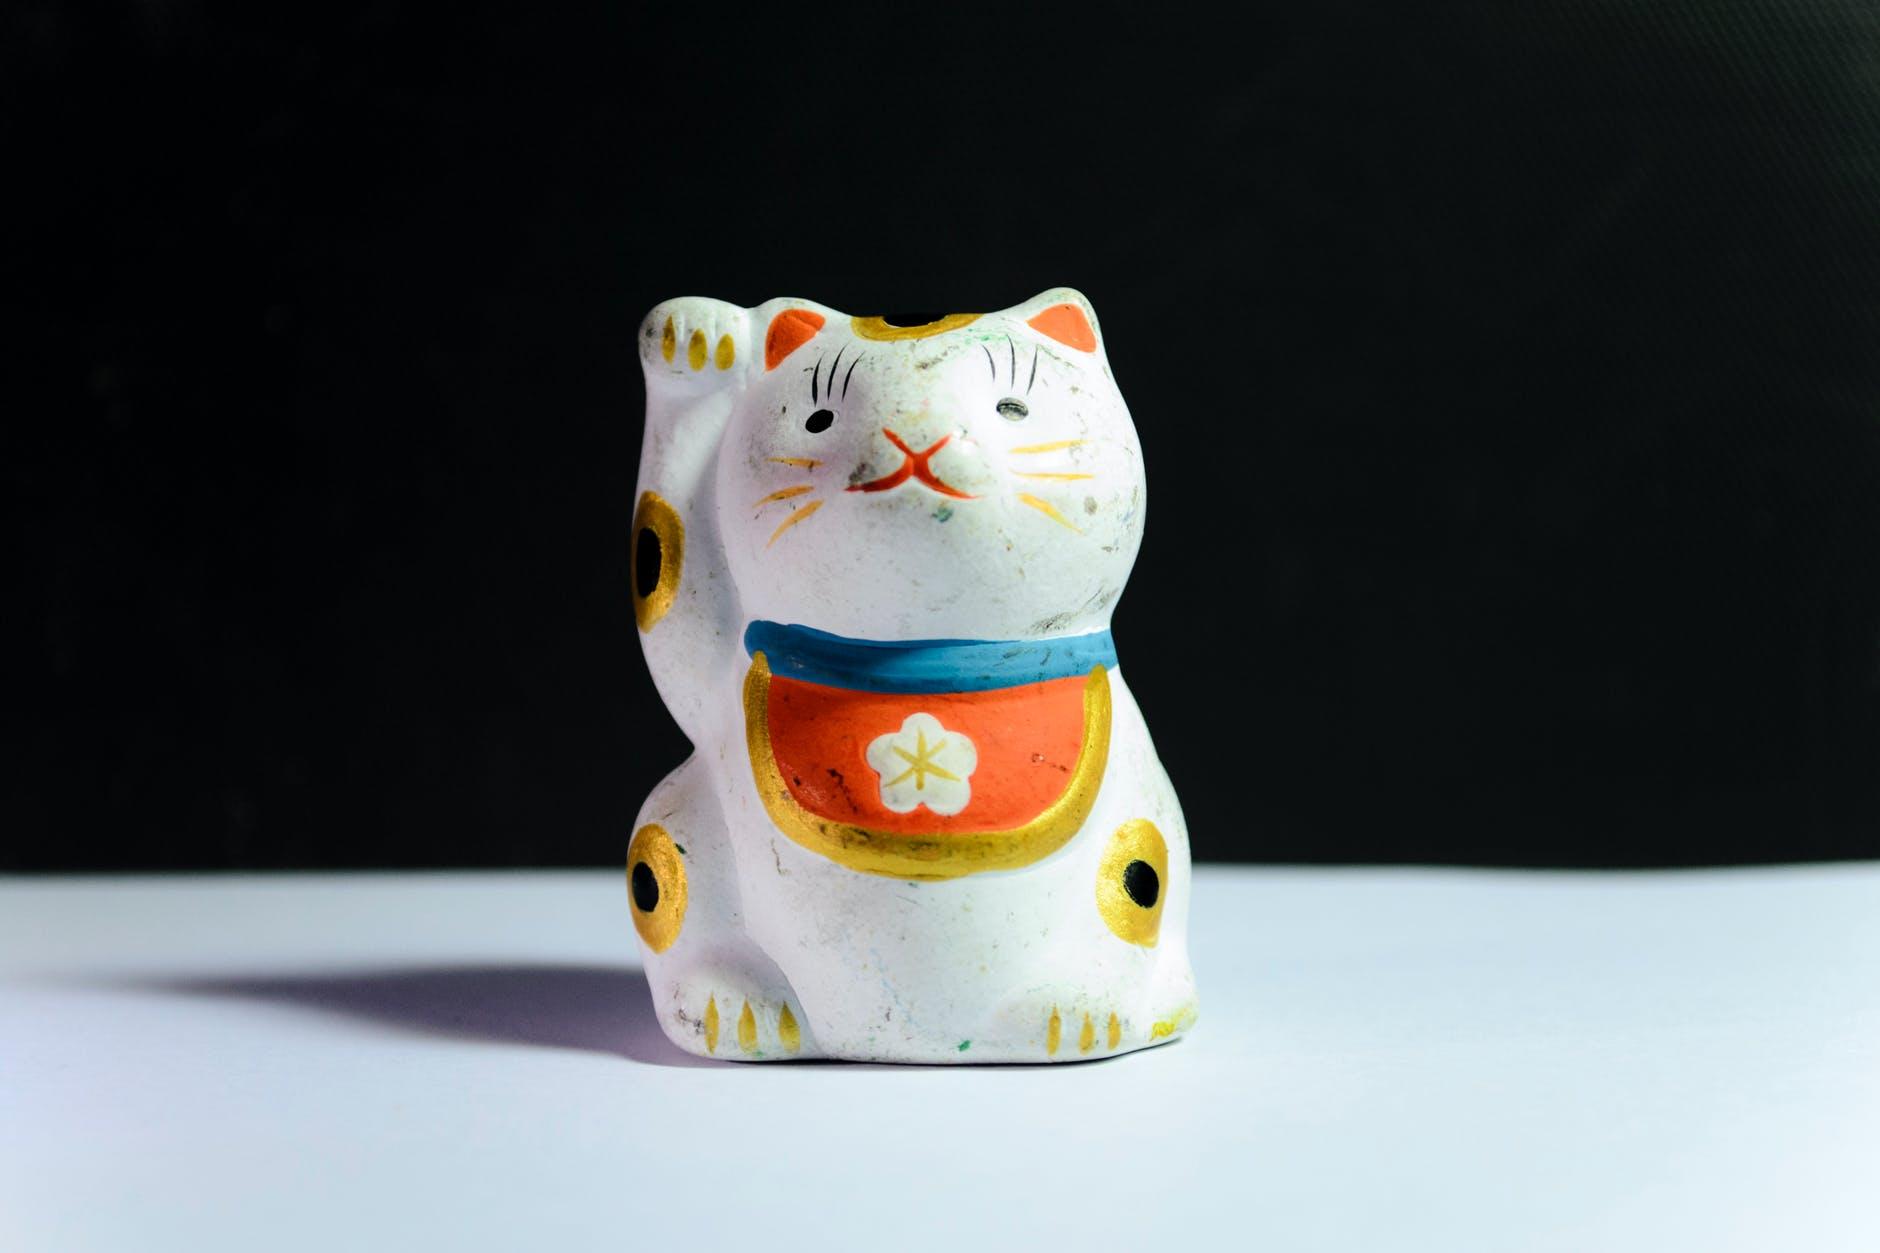 maneki neko figurine on white surface